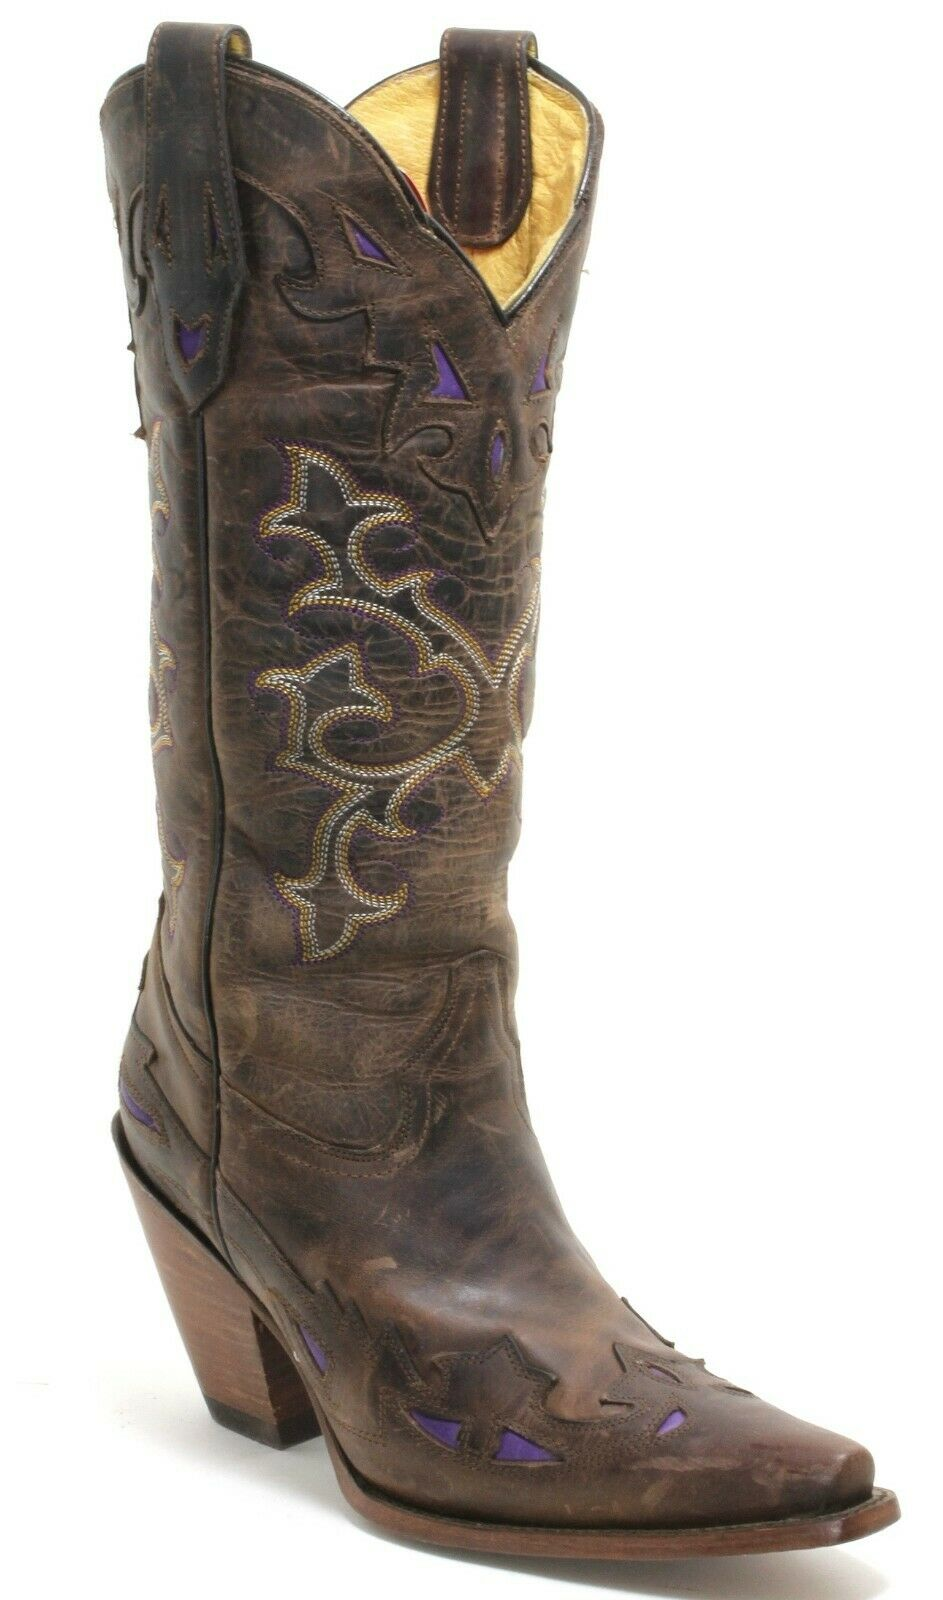 271 Cowboystiefel Westernstiefel Westernstiefel